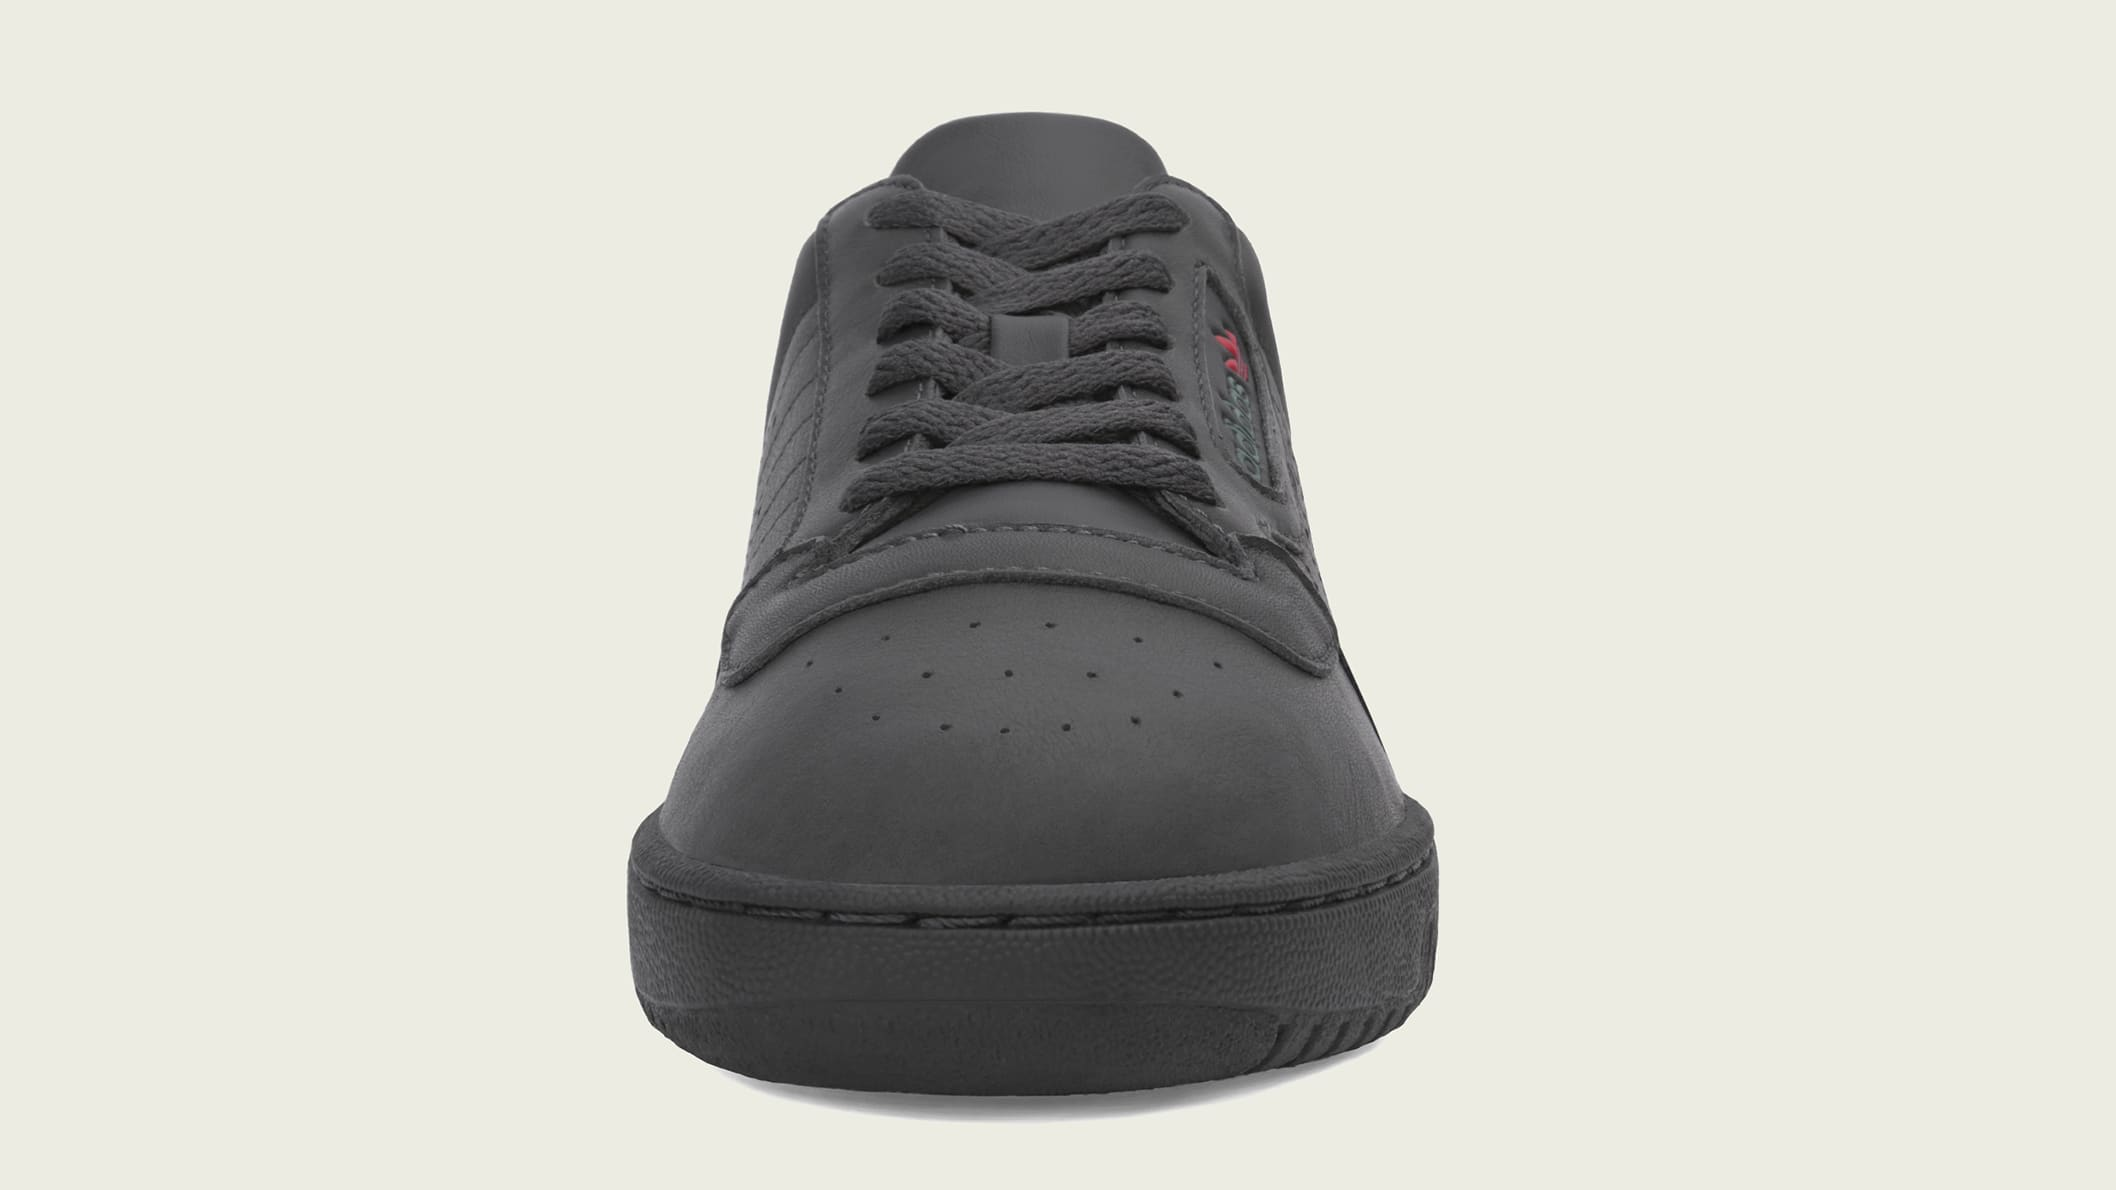 Adidas Yeezy Powerphase 'Core Black' CG6420 (Front)